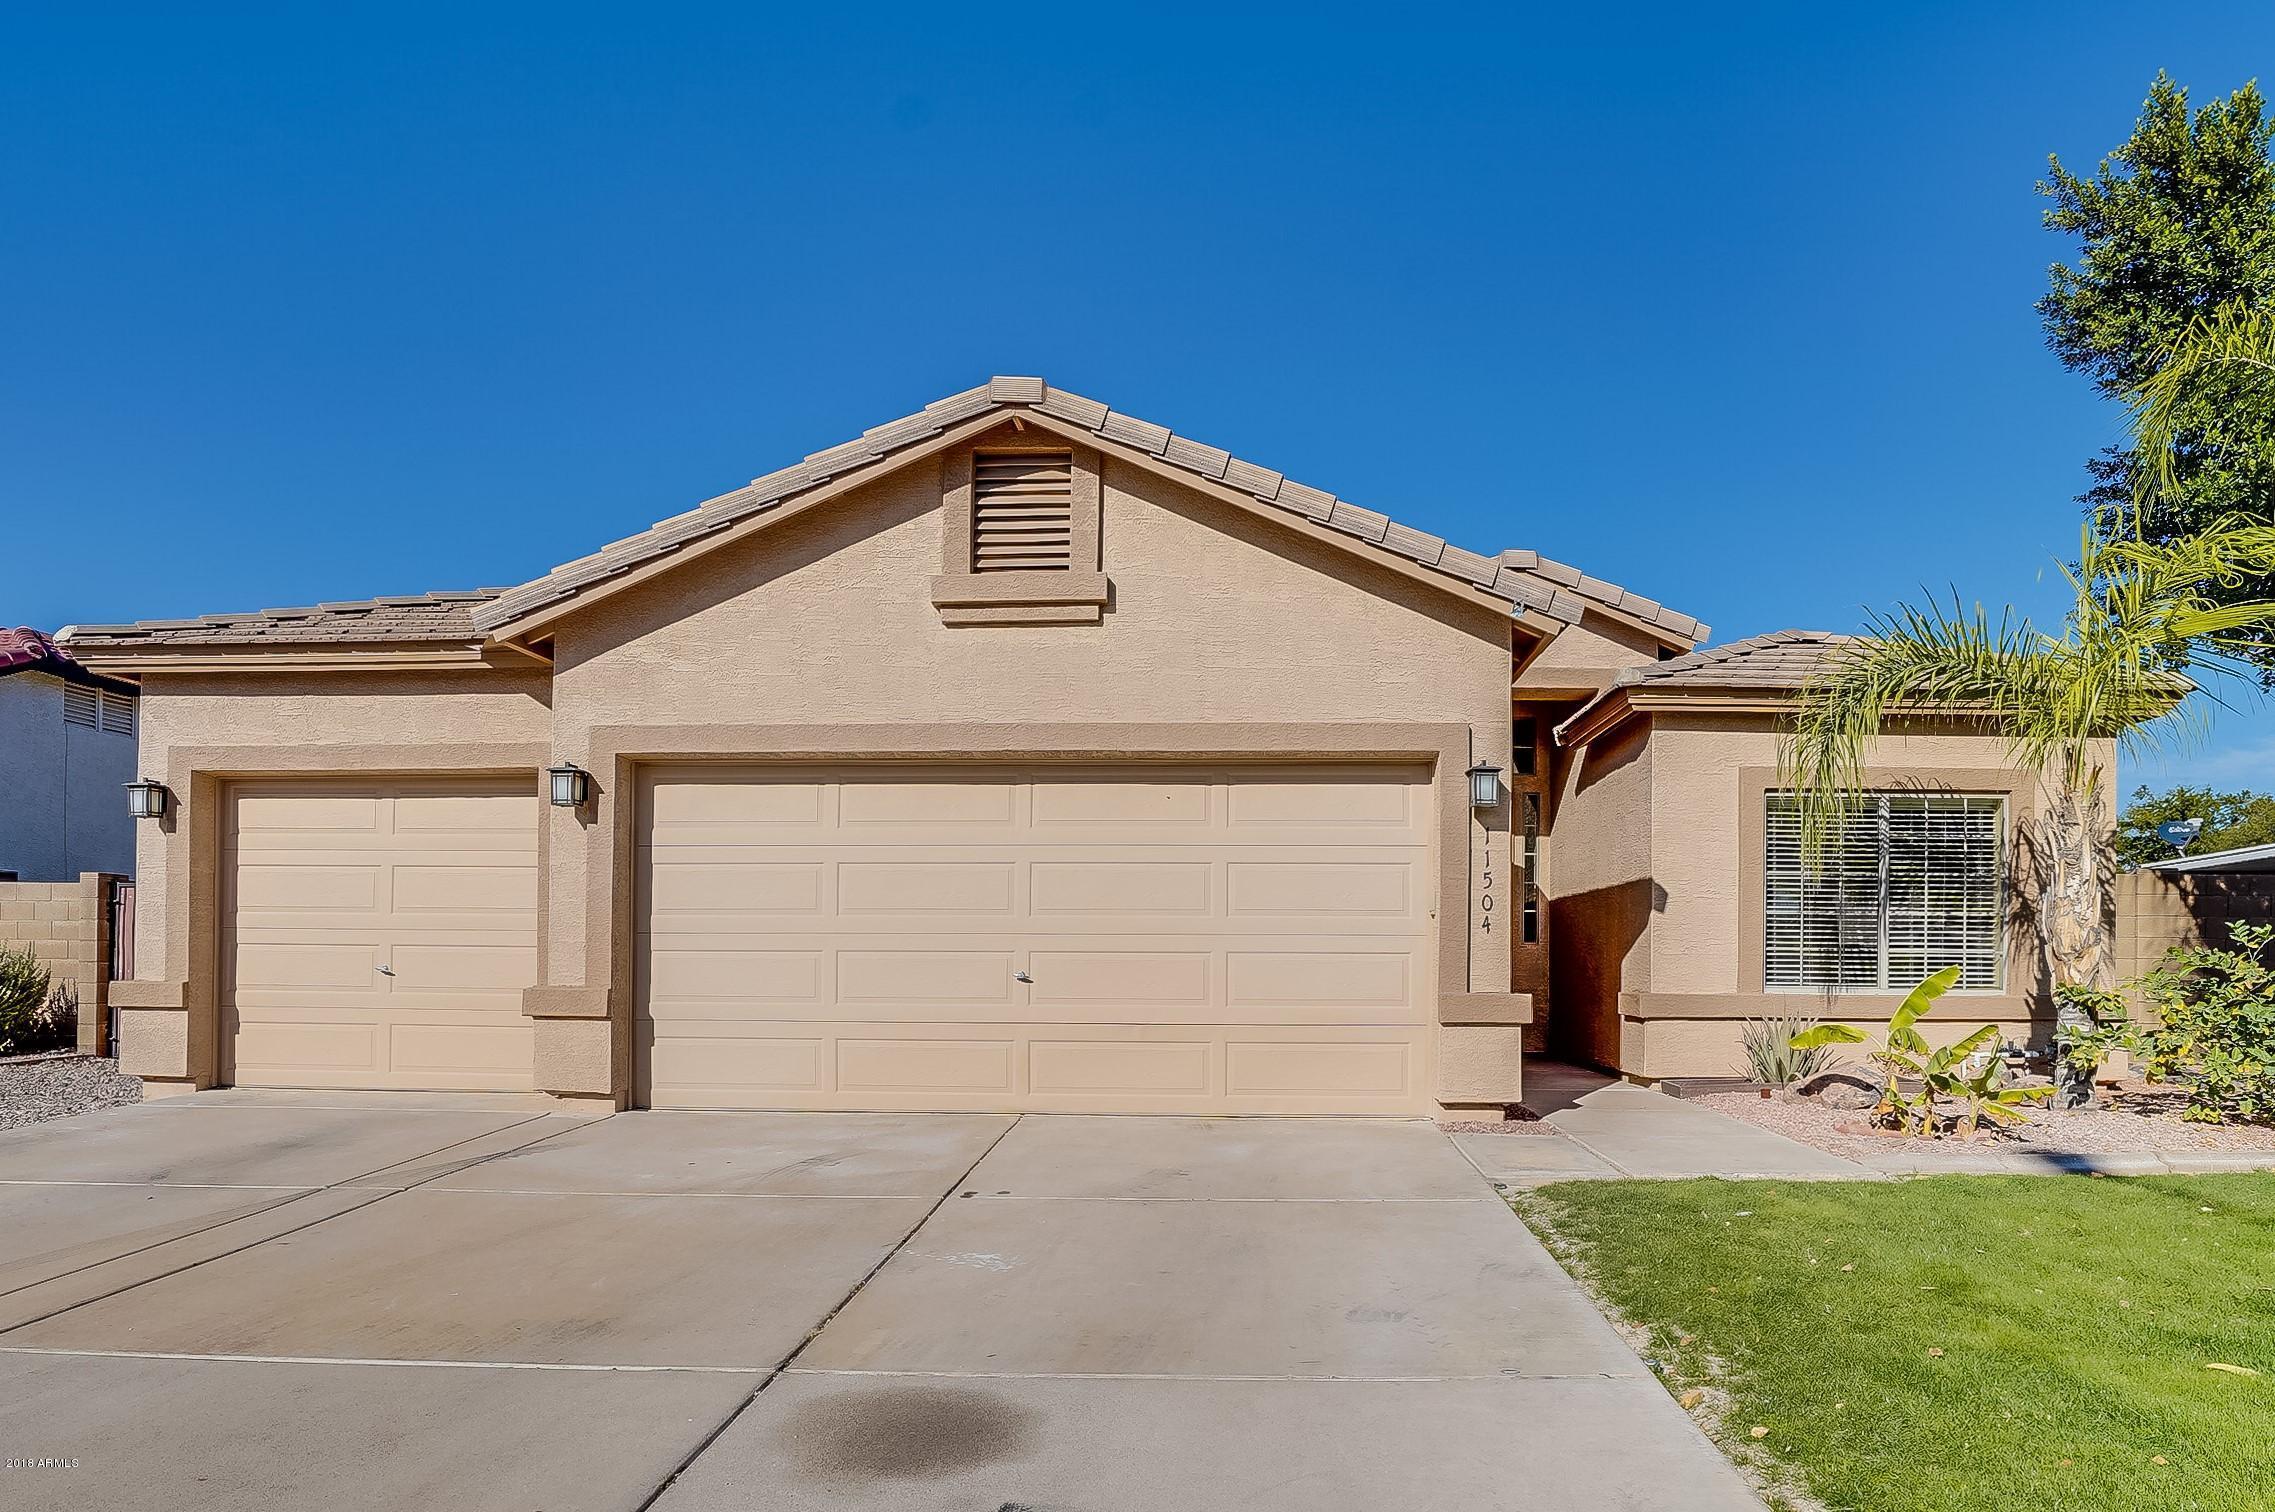 Photo of 11504 E DECATUR Street, Mesa, AZ 85207